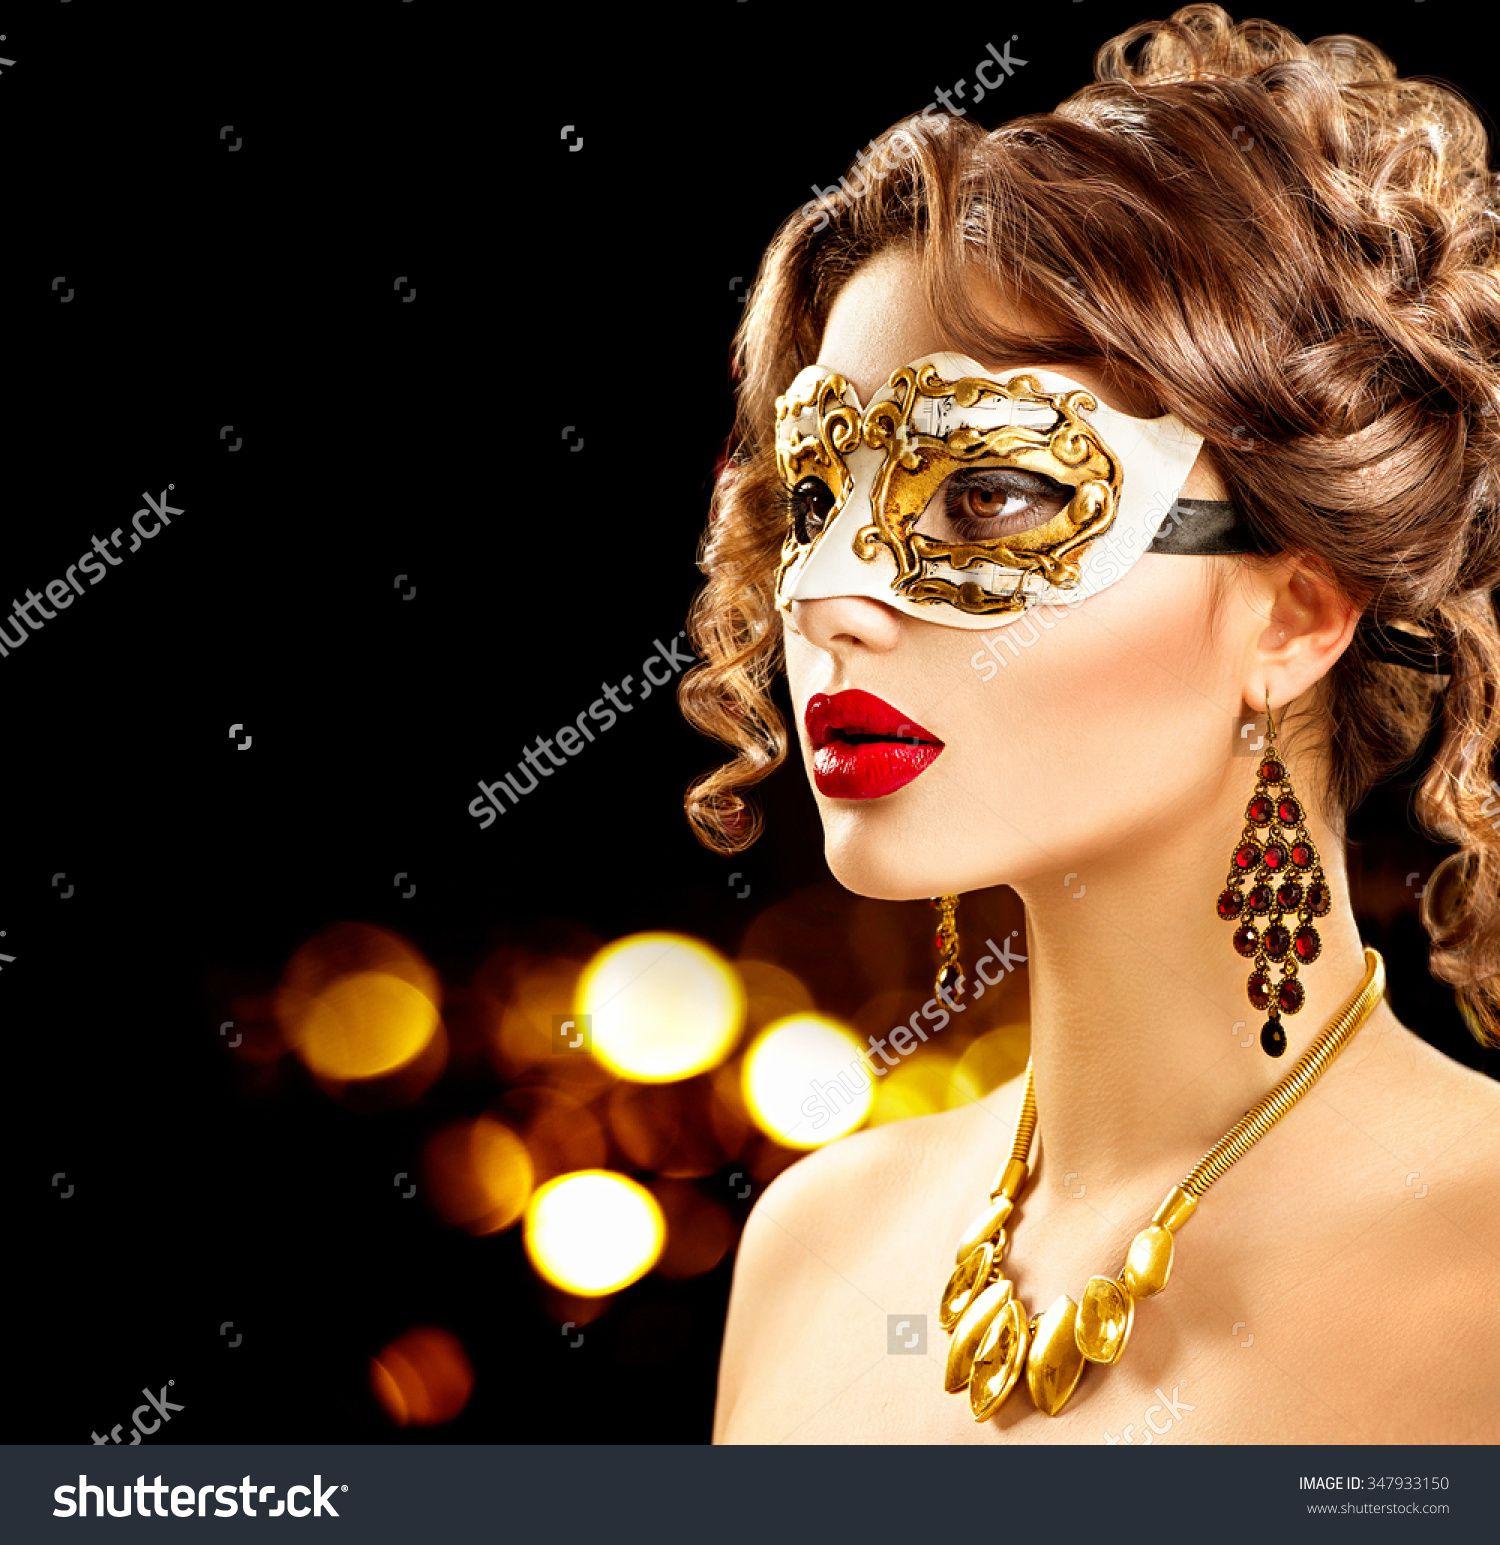 pin by lisa coplit on venetian carnevale | masquerade makeup